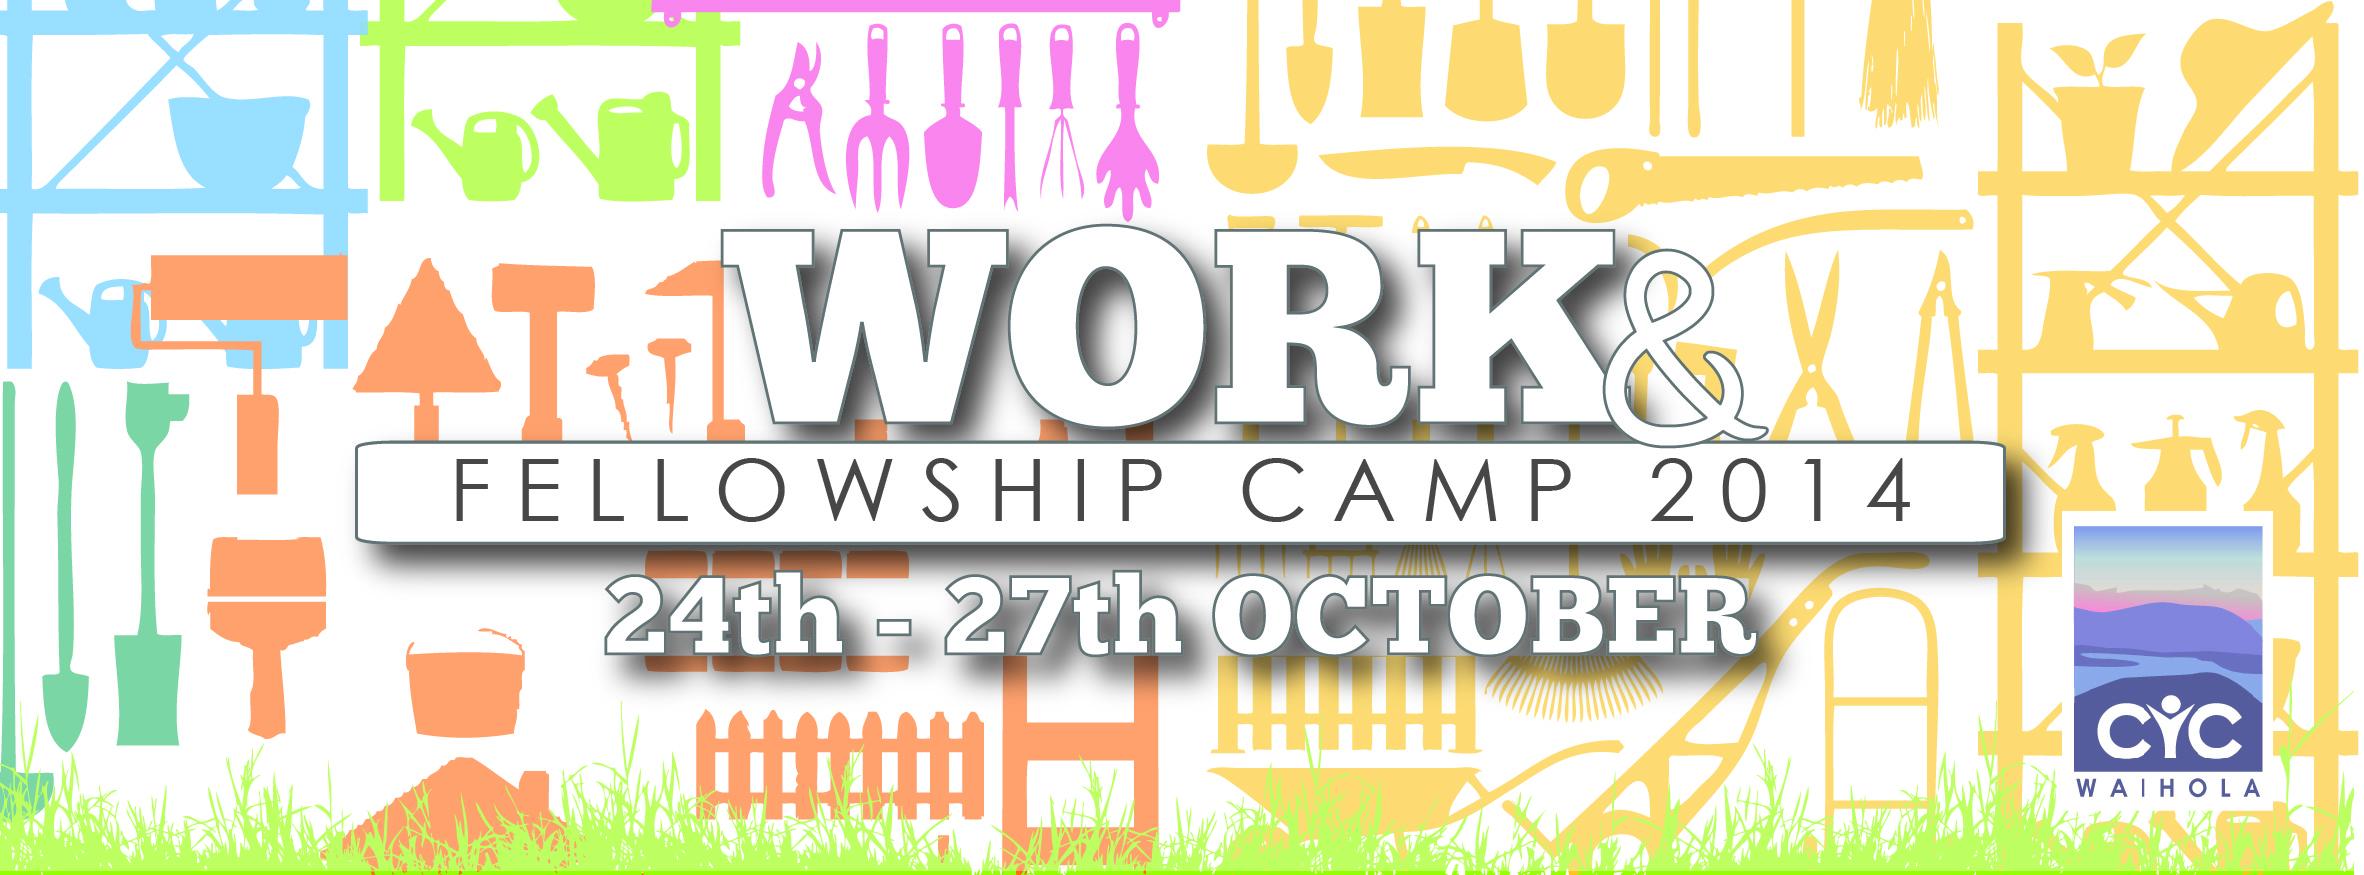 2014 Work & Fellowship Camp